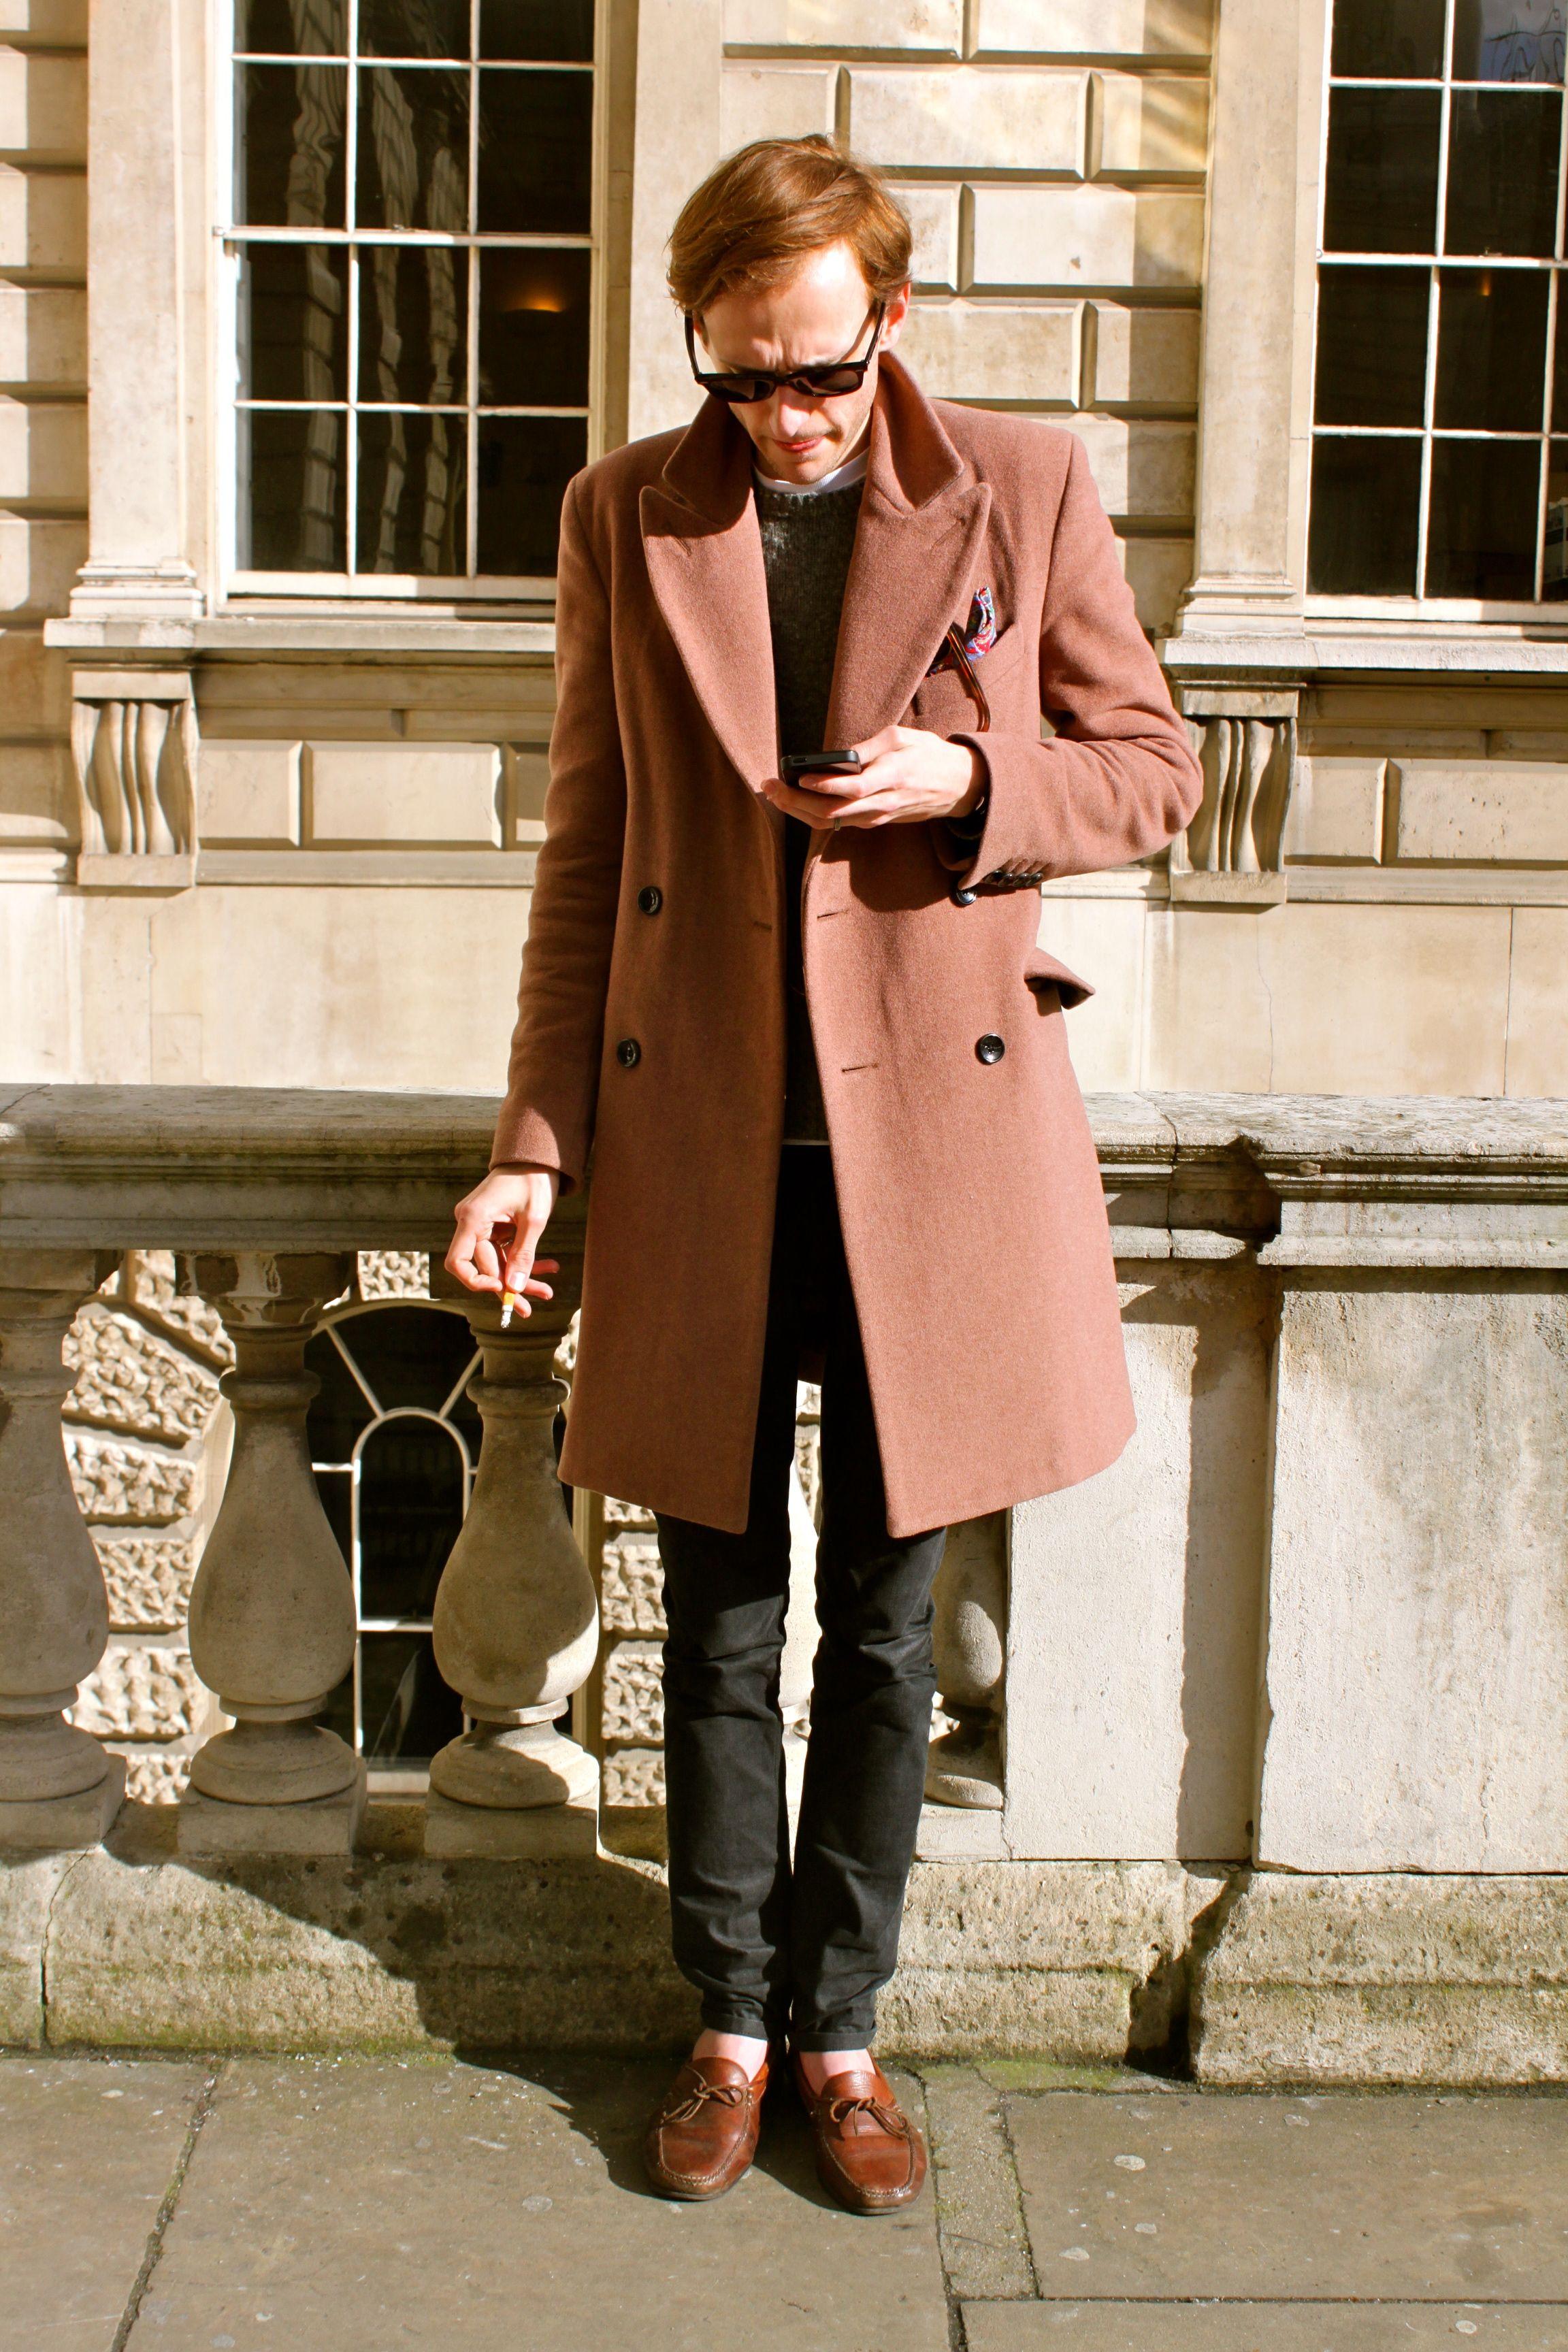 Men's fashion/long coat/long peacoat/fashion colour/besides red/denim/street style /winter style/winter Sunday